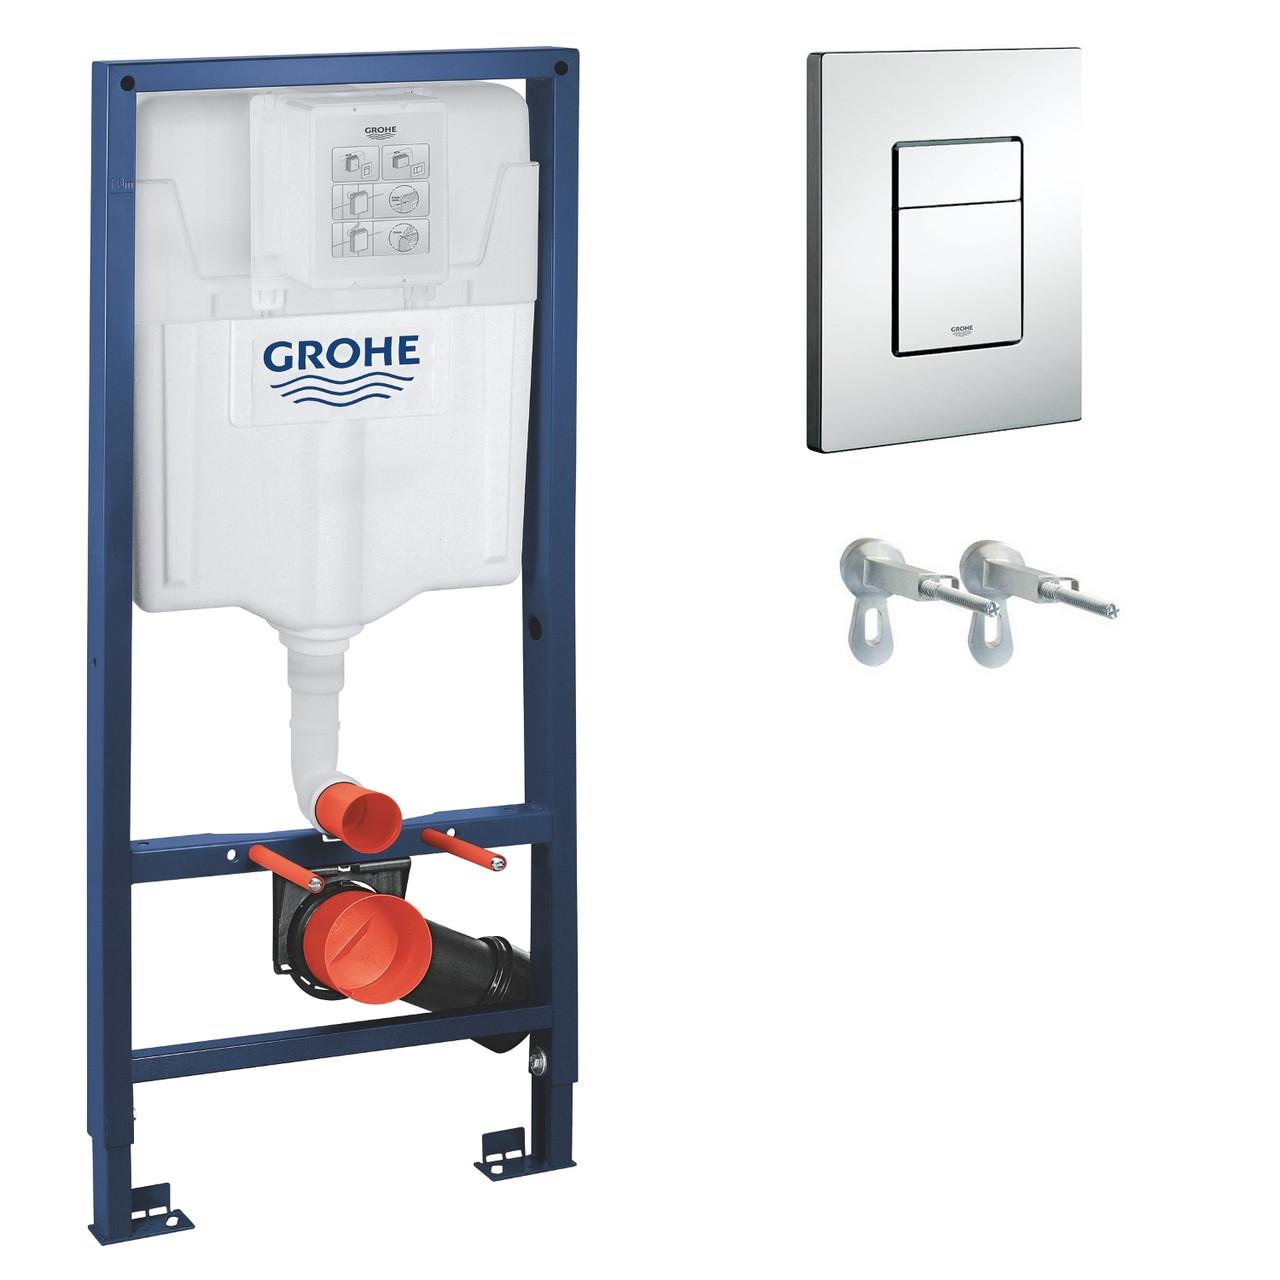 GROHE  Rapid SL Инсталяционная система для подвесного унитаза 3 в 1(аналог-38775001)  БЕЗ ПРОКЛАДКИ